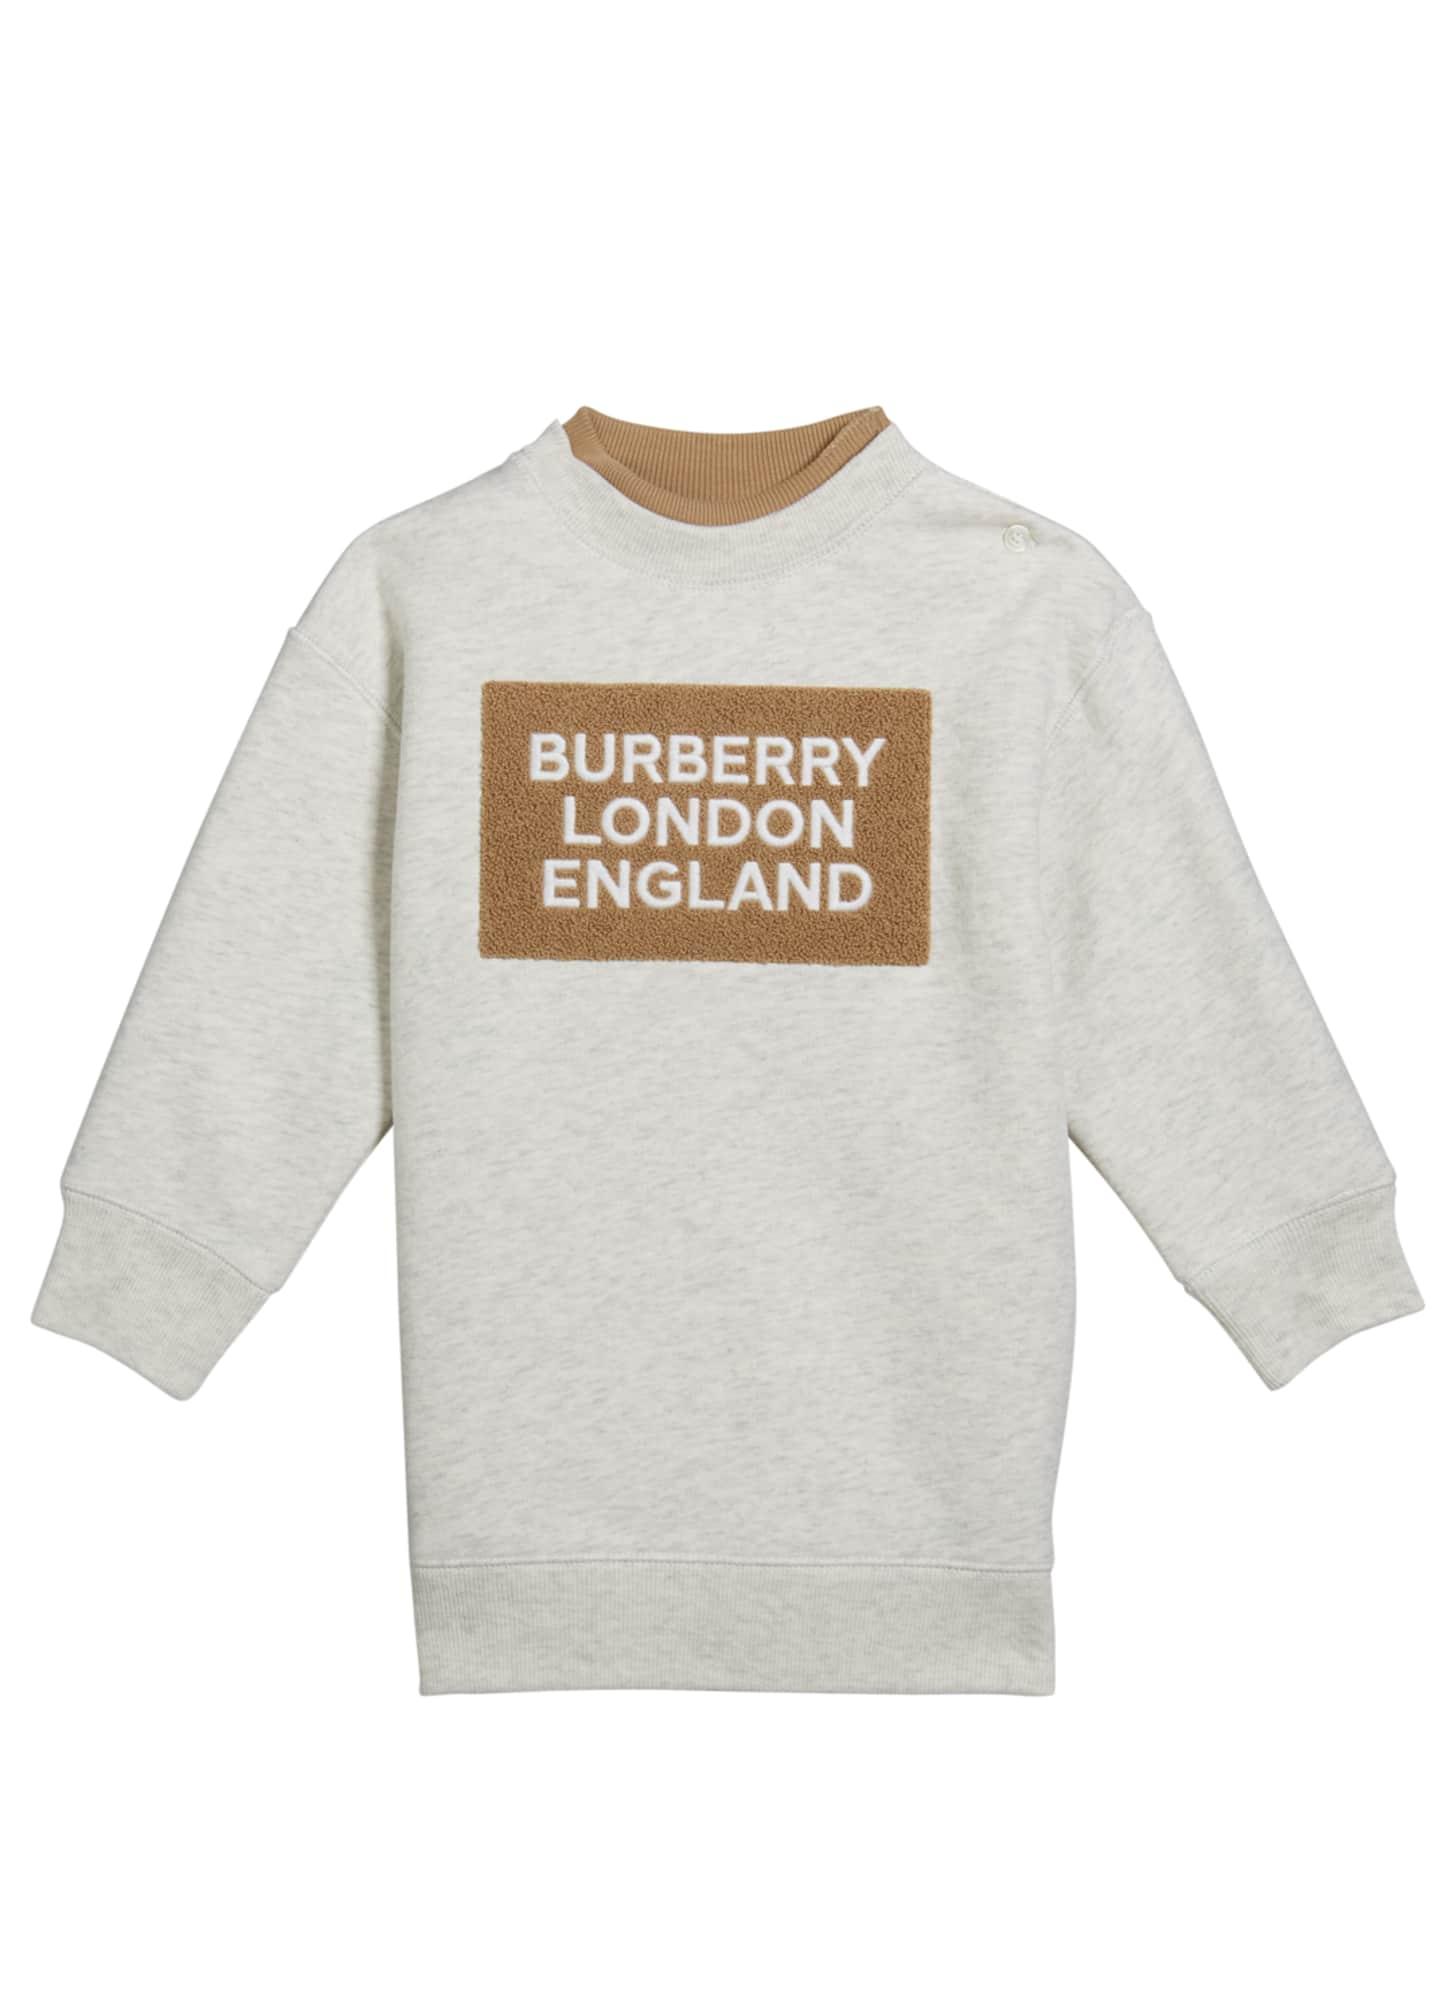 Burberry Girl's Fabbio Sweatshirt Dress w/ Logo Patches,